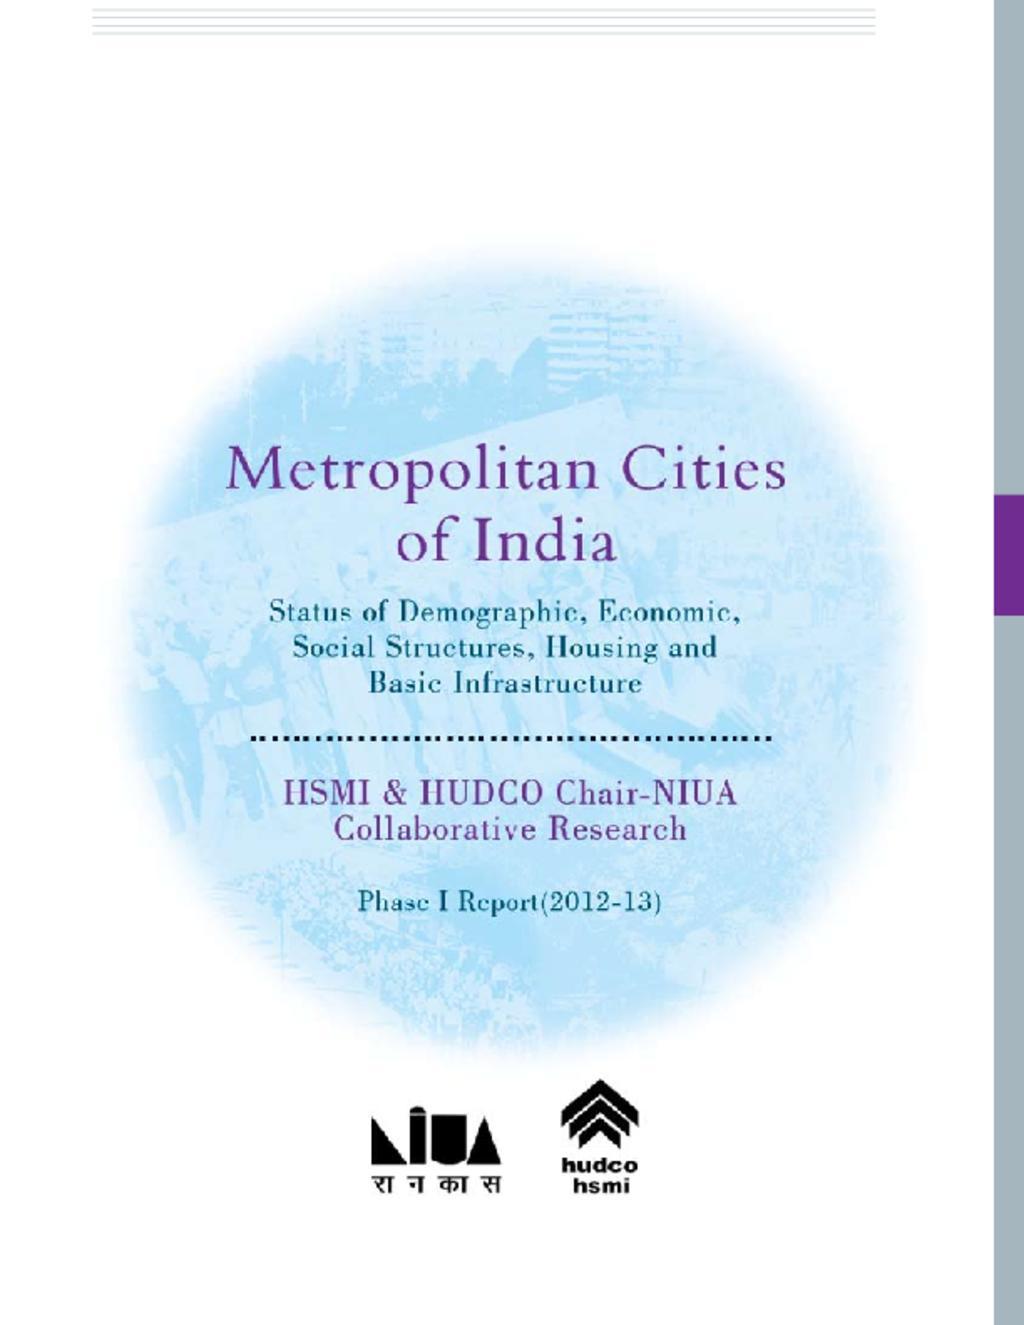 NIUA-HUDCO Study 2014